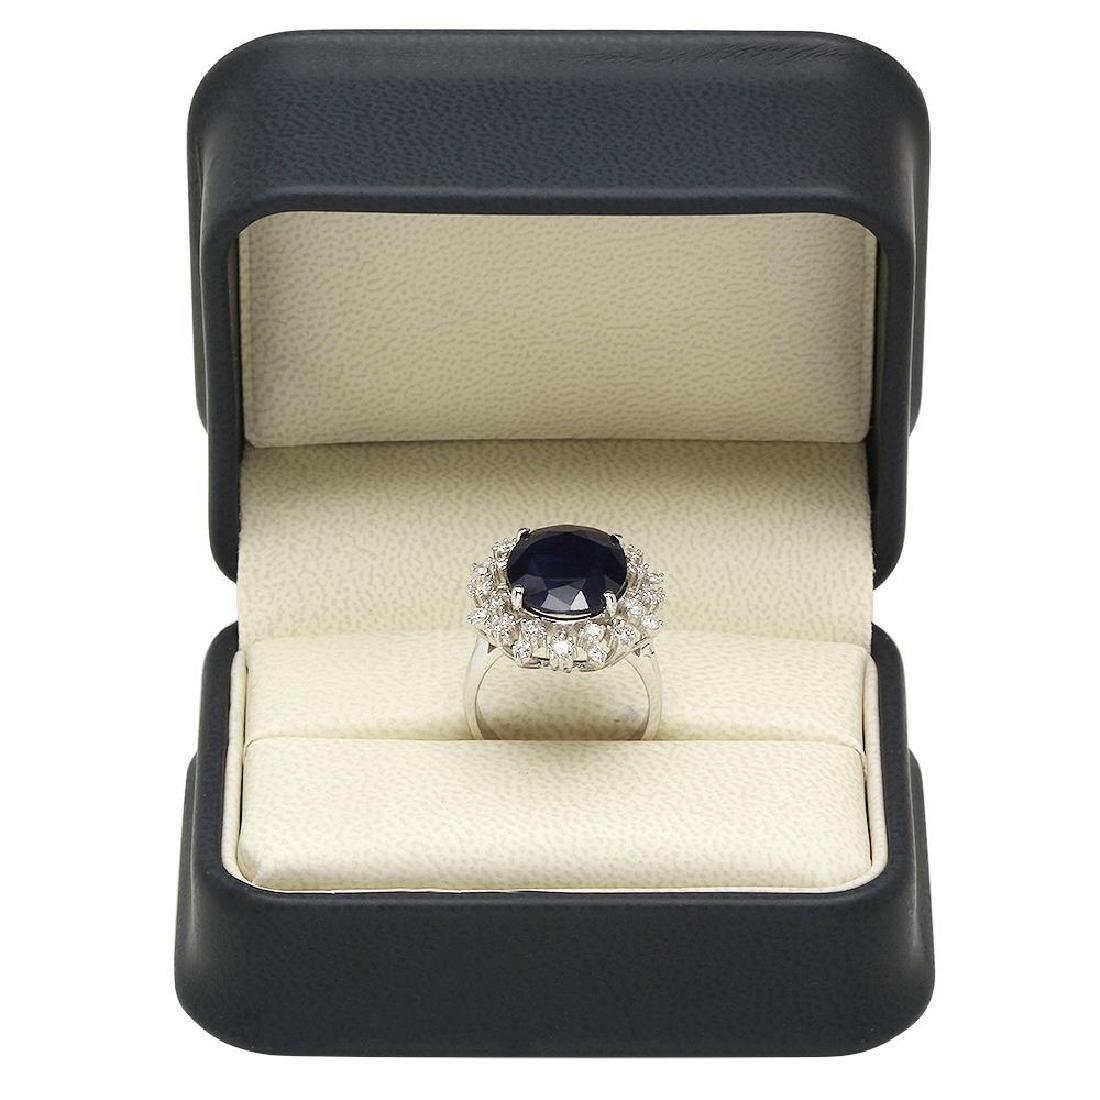 14K Gold 8.67ct Sapphire 0.93ct Diamond Ring - 4